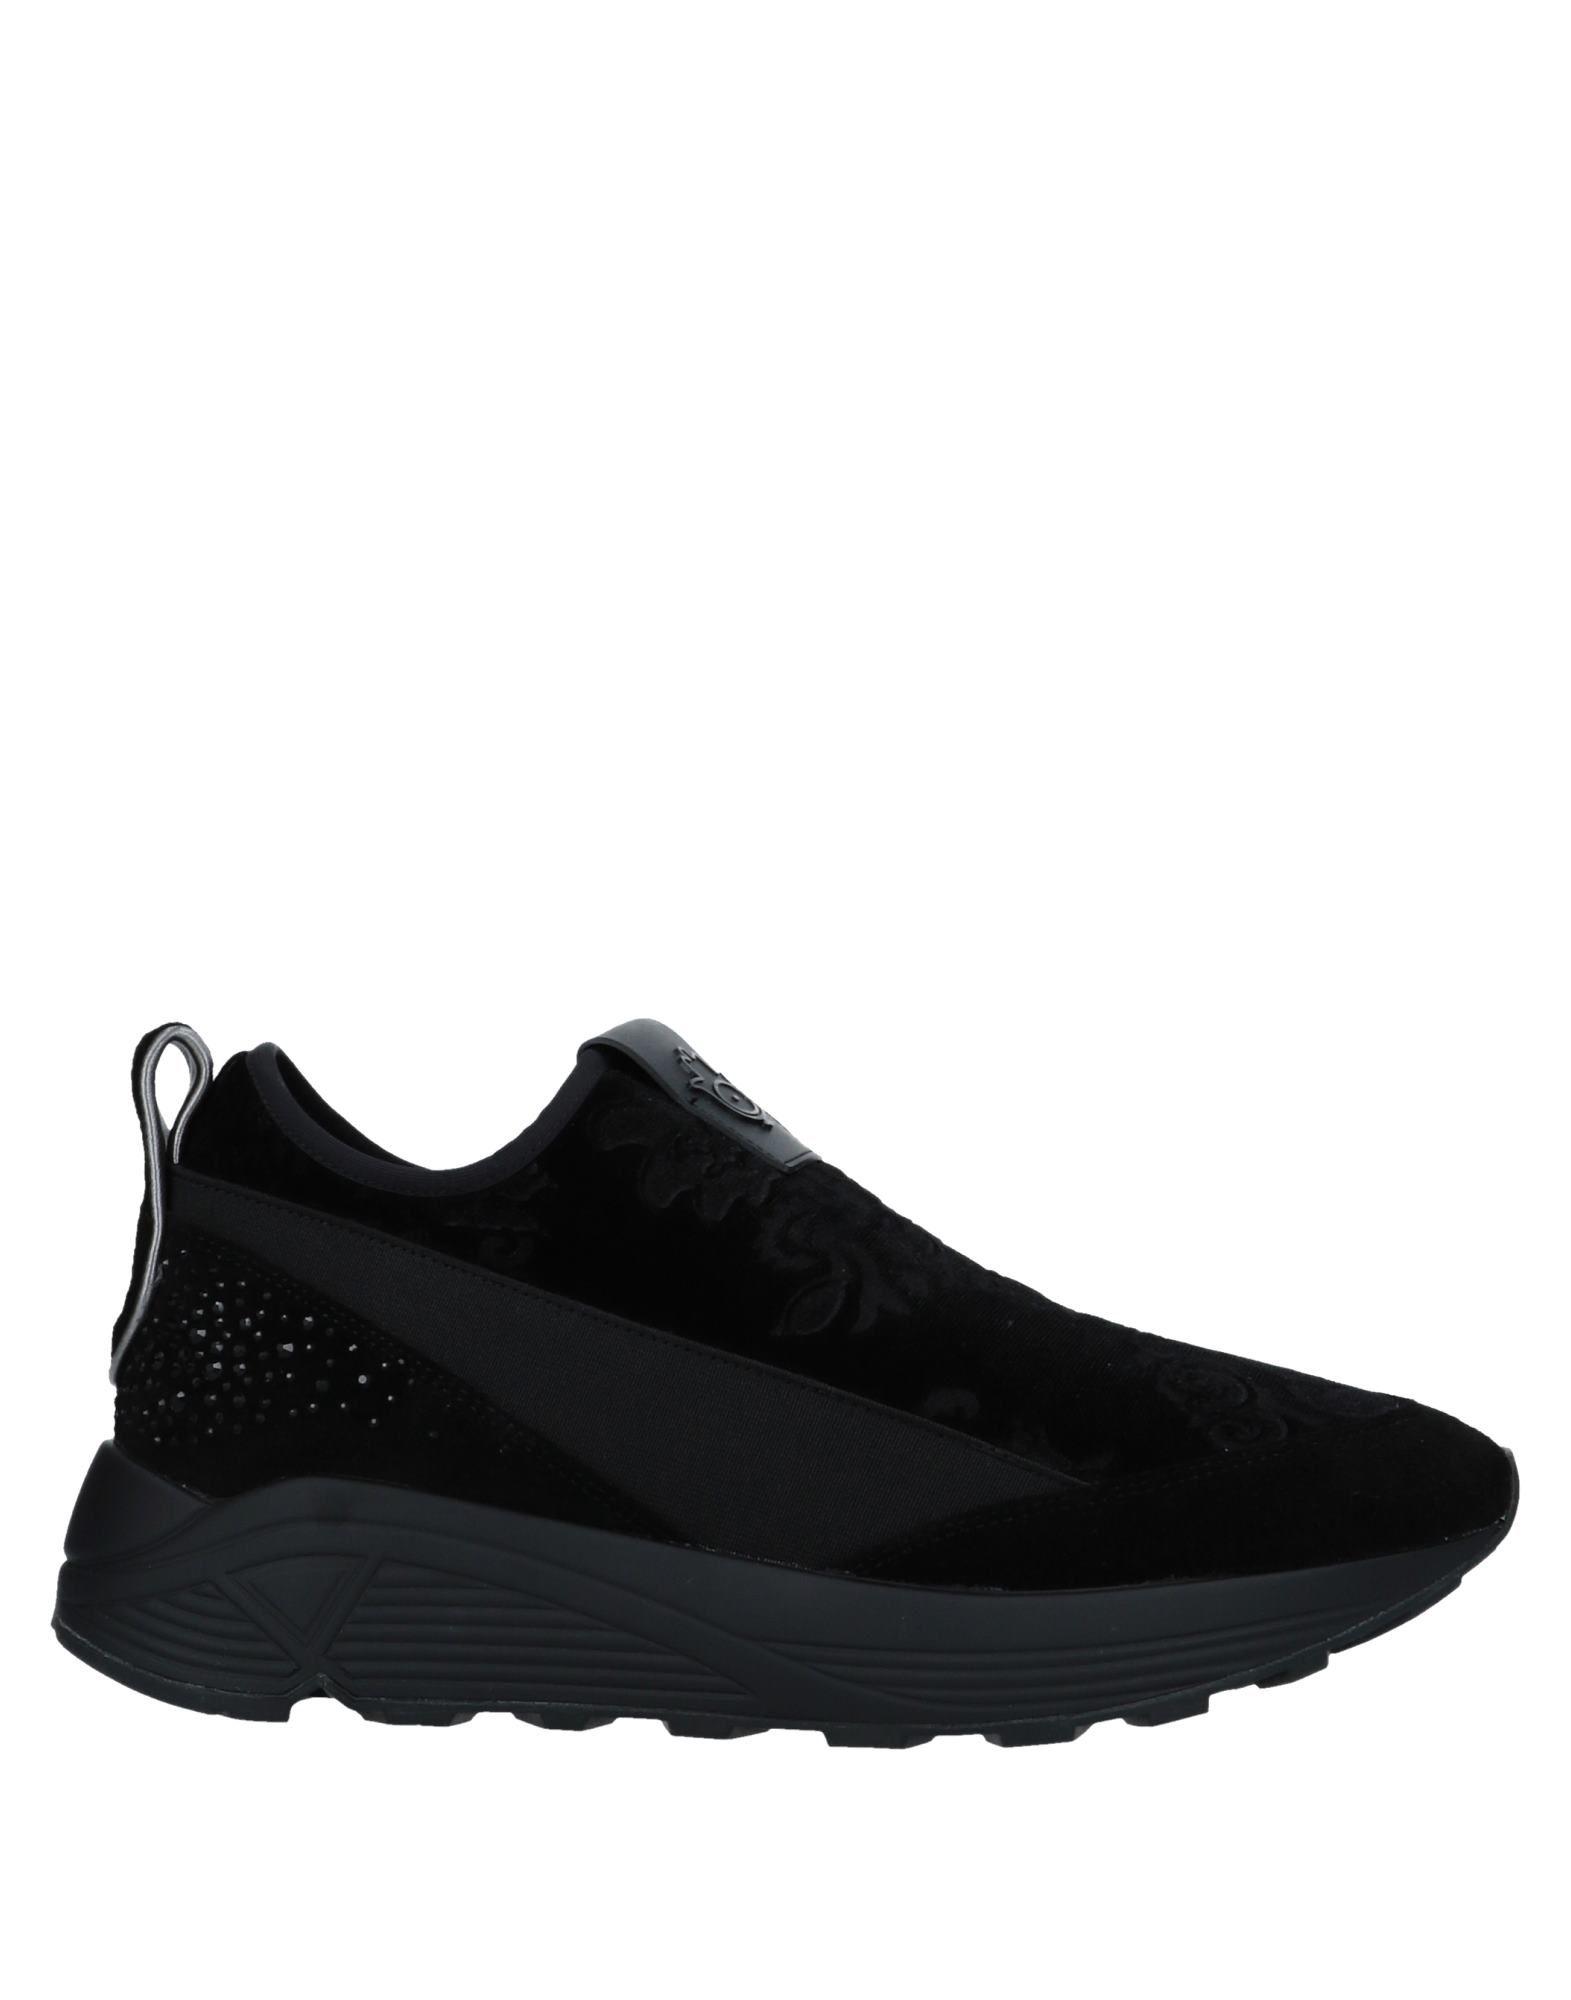 Roberto Della Croce Sneakers Damen  11528877MI Gute Qualität beliebte Schuhe